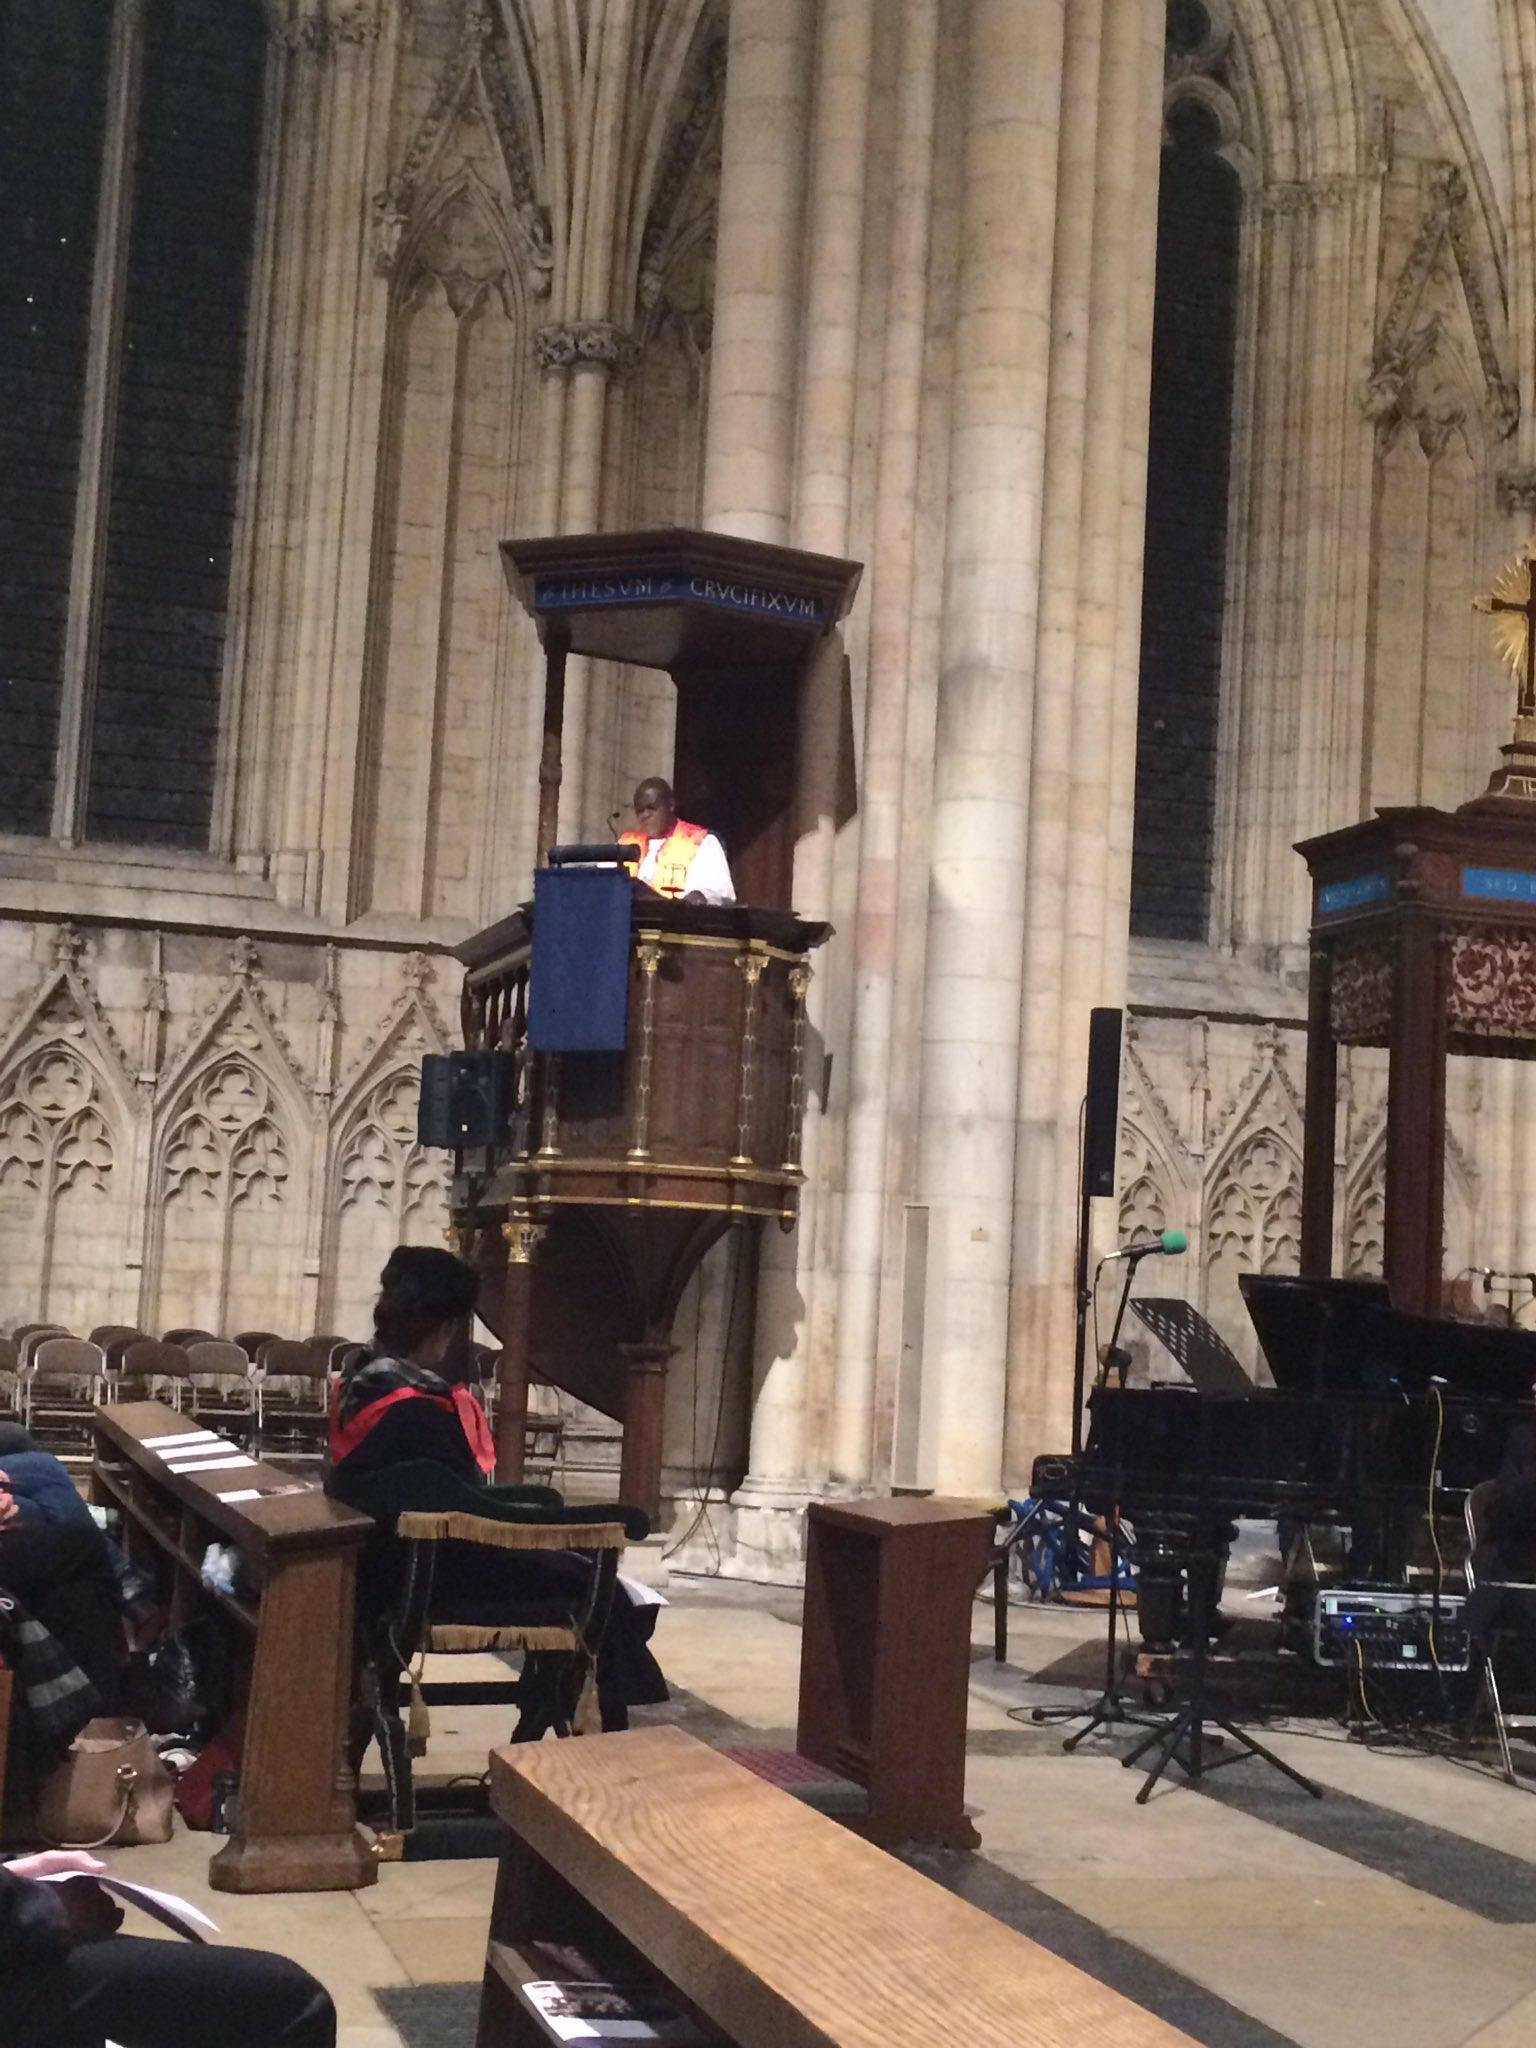 The Archbishop of York @JohnSentamu 'Church schools offering hope' #ManorMoments https://t.co/71ScgzRJB3